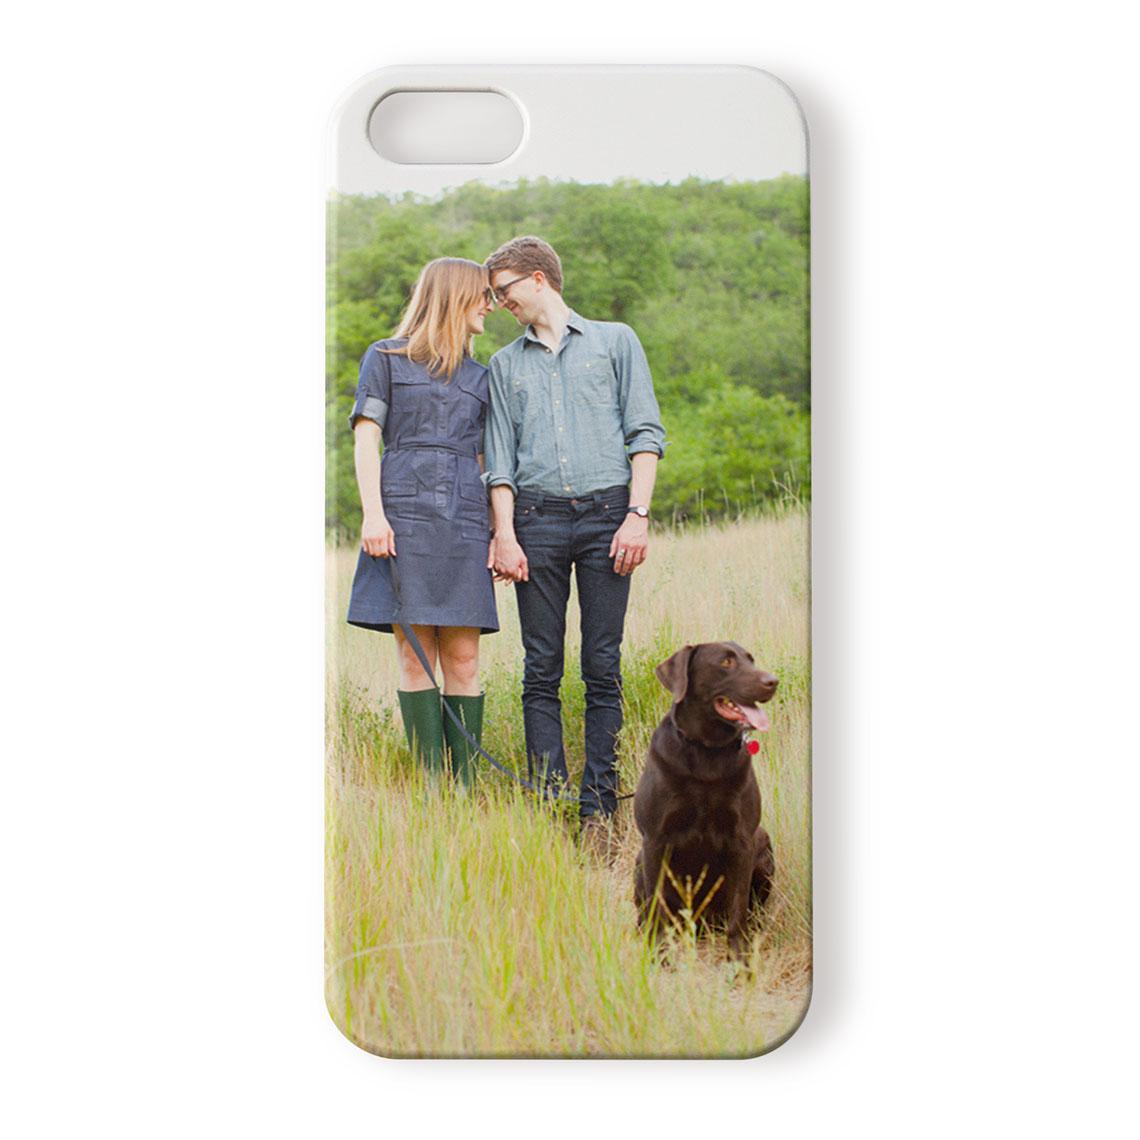 Iphone 5 5s Case Slim Phone Cases Gifts Snapfish Us